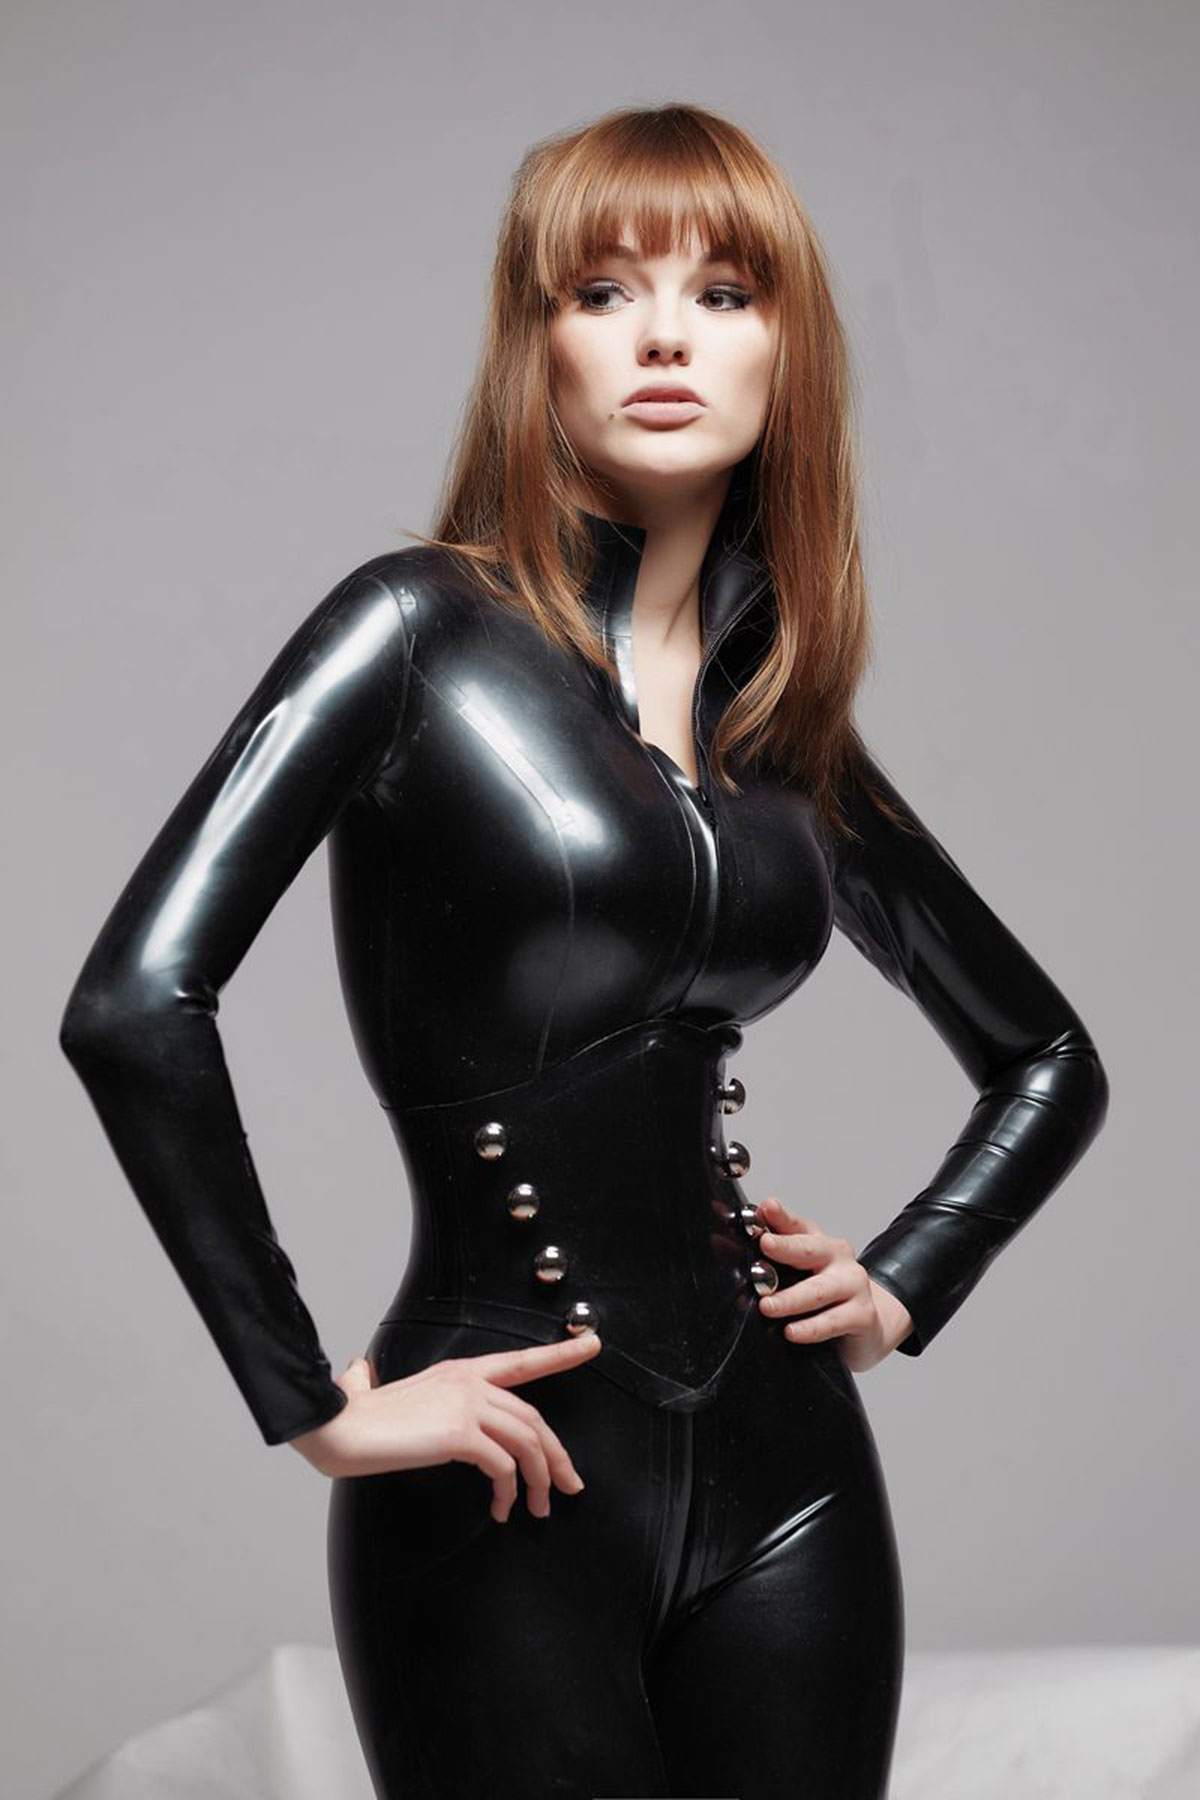 Beautiful blonde vamp mistress in black fetish corset on white home background stock image